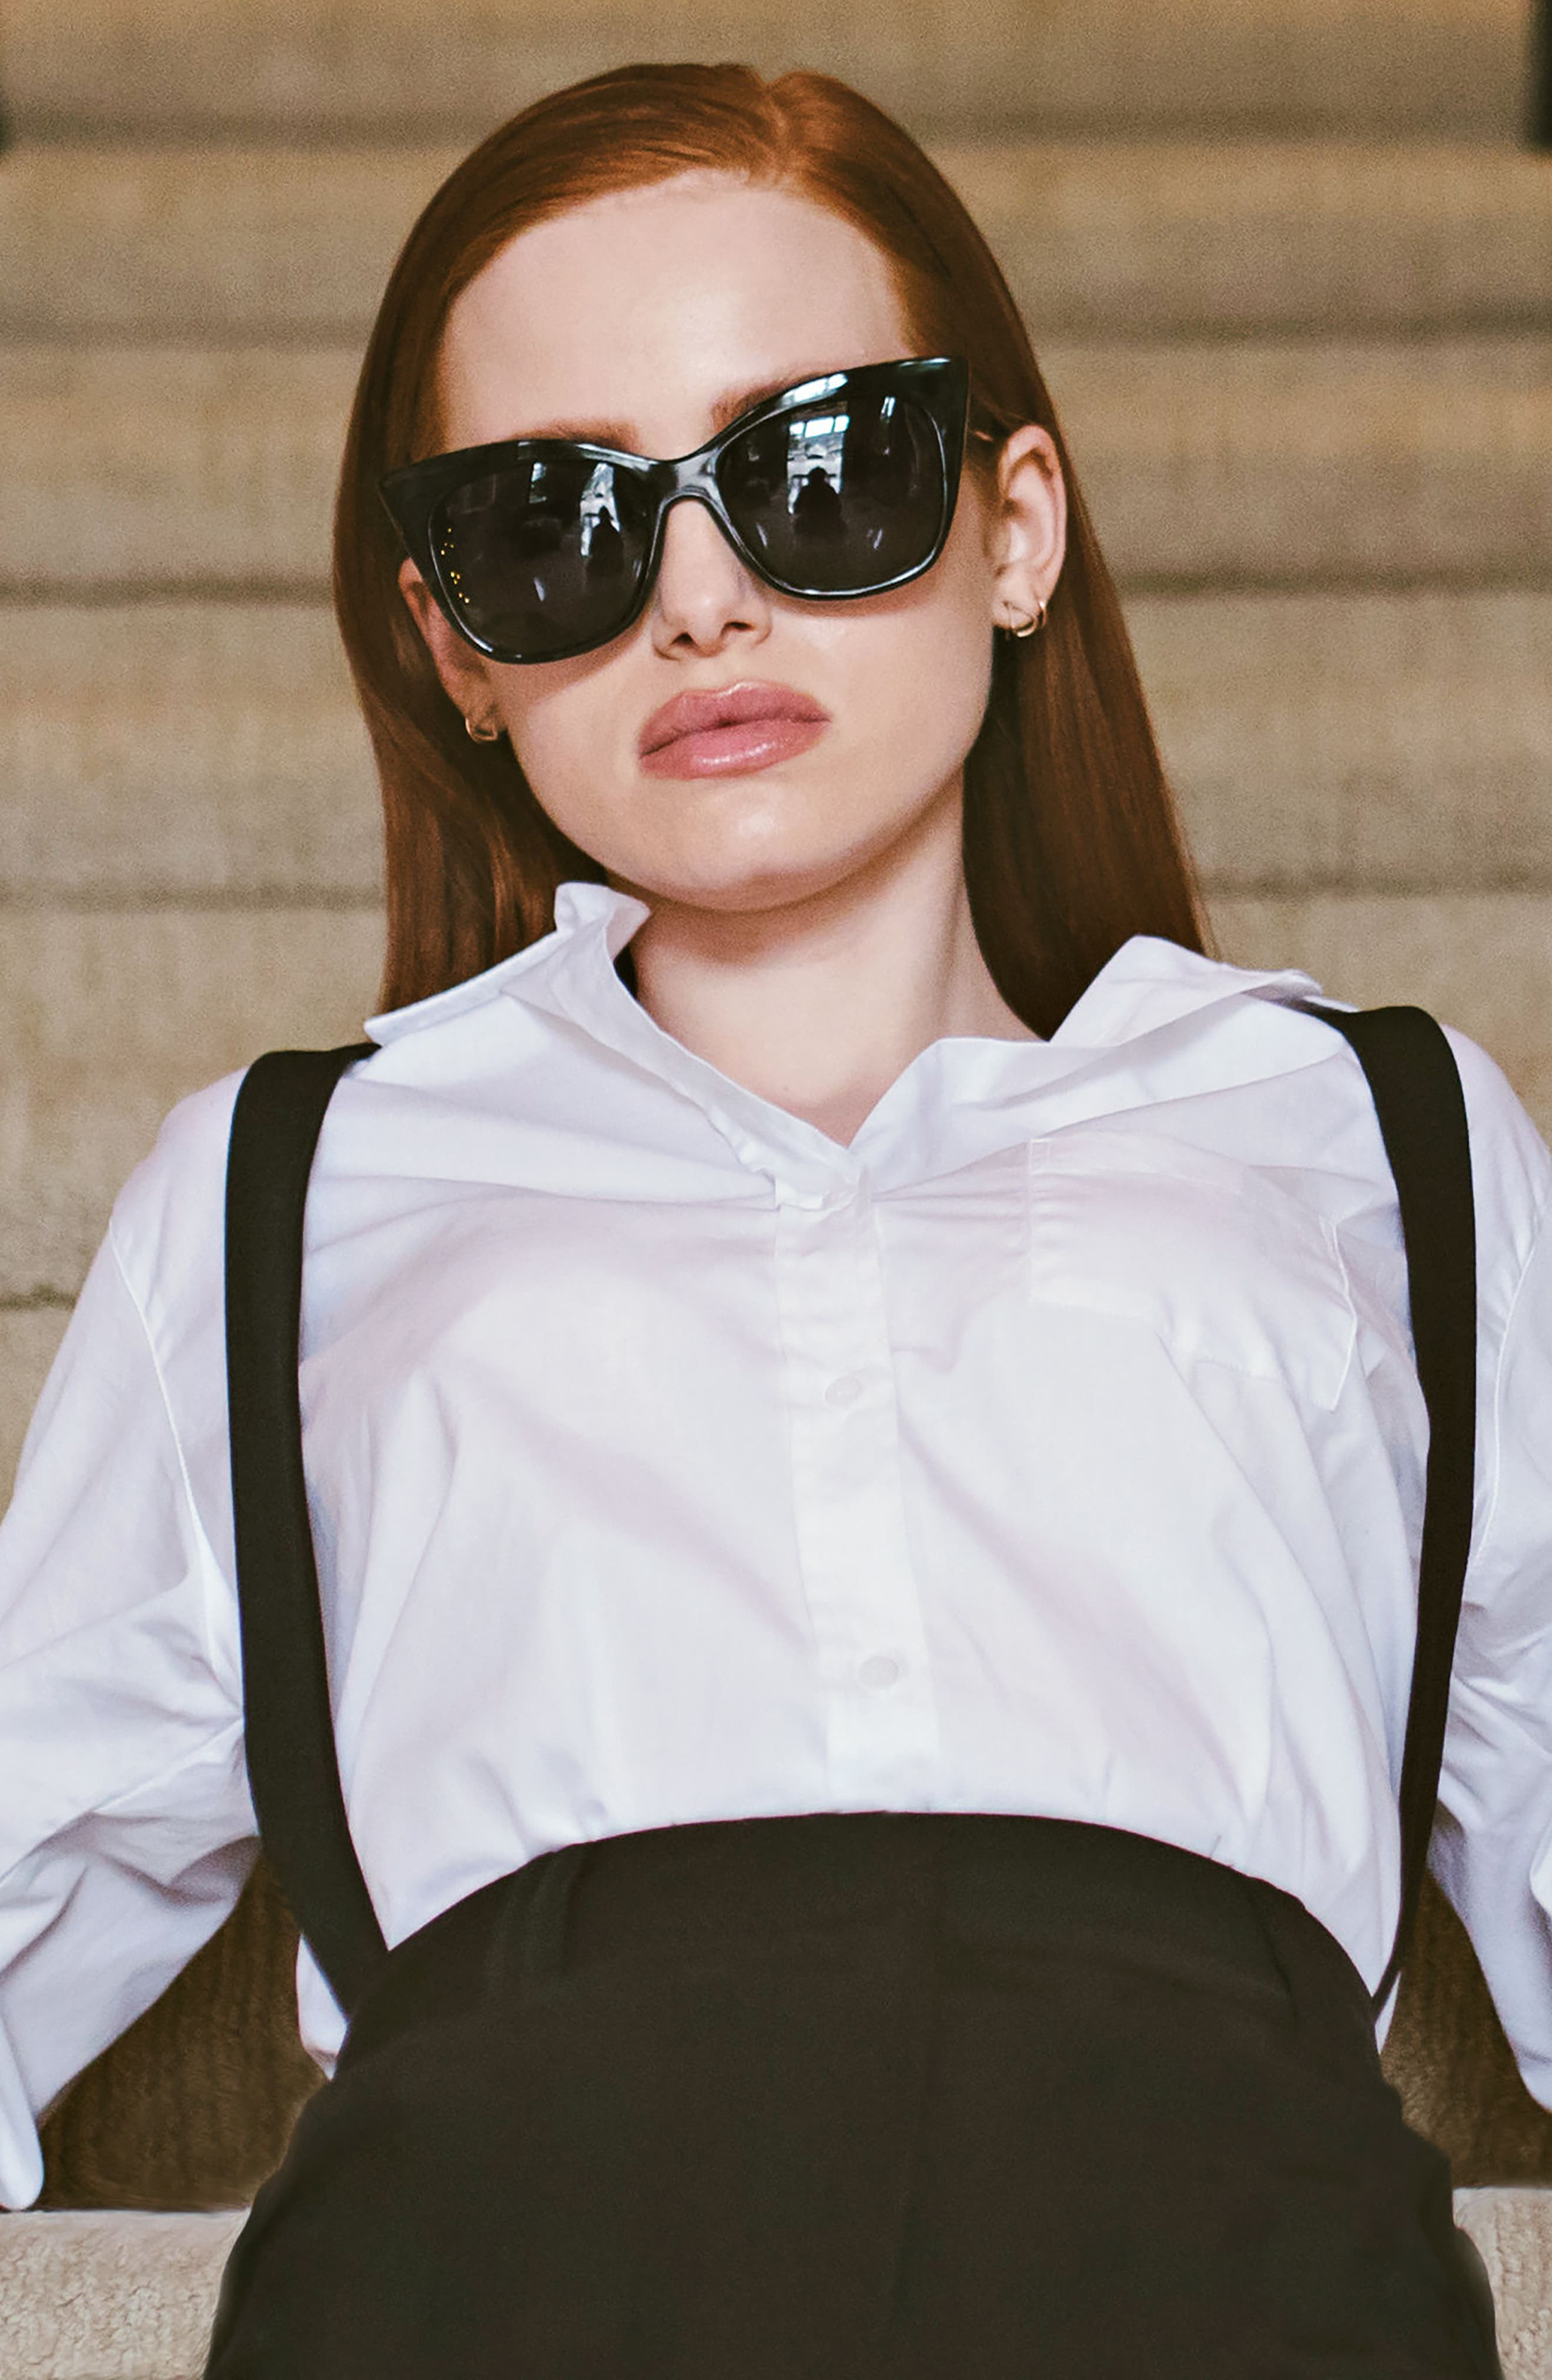 Privé Revaux x Madelaine Petsch The Mister 54mm Cat Eye Sunglasses,                             Alternate thumbnail 6, color,                             BLACK/ BLACK